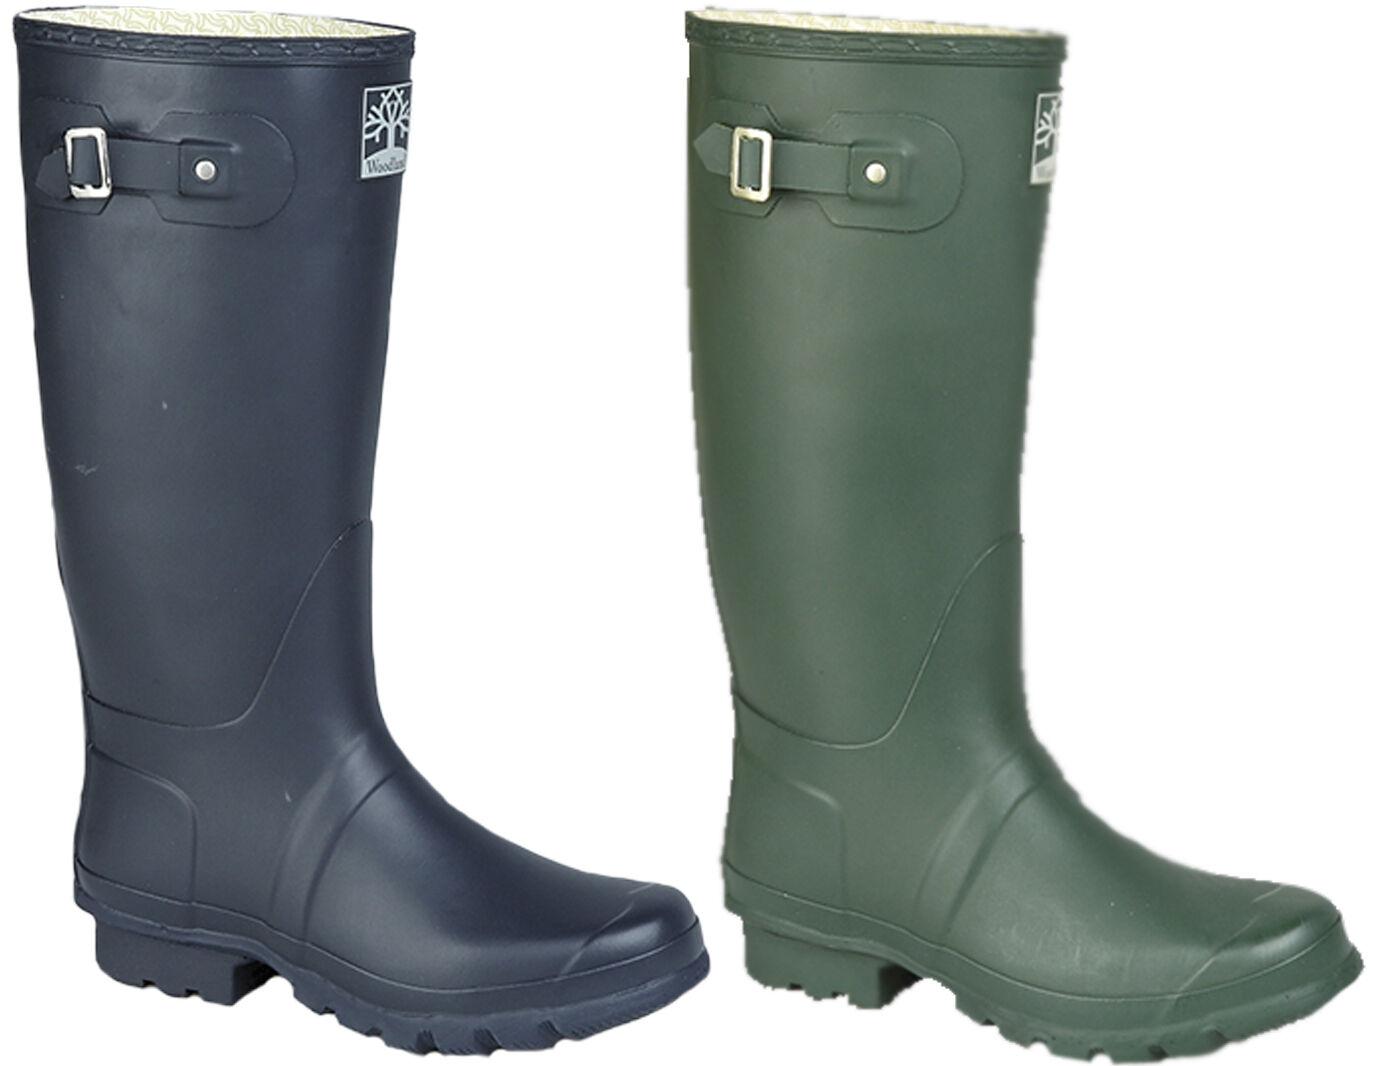 Mens Boys Wellingtons Boots Woodland Wellies bluee Green Boots UK 3 - 15